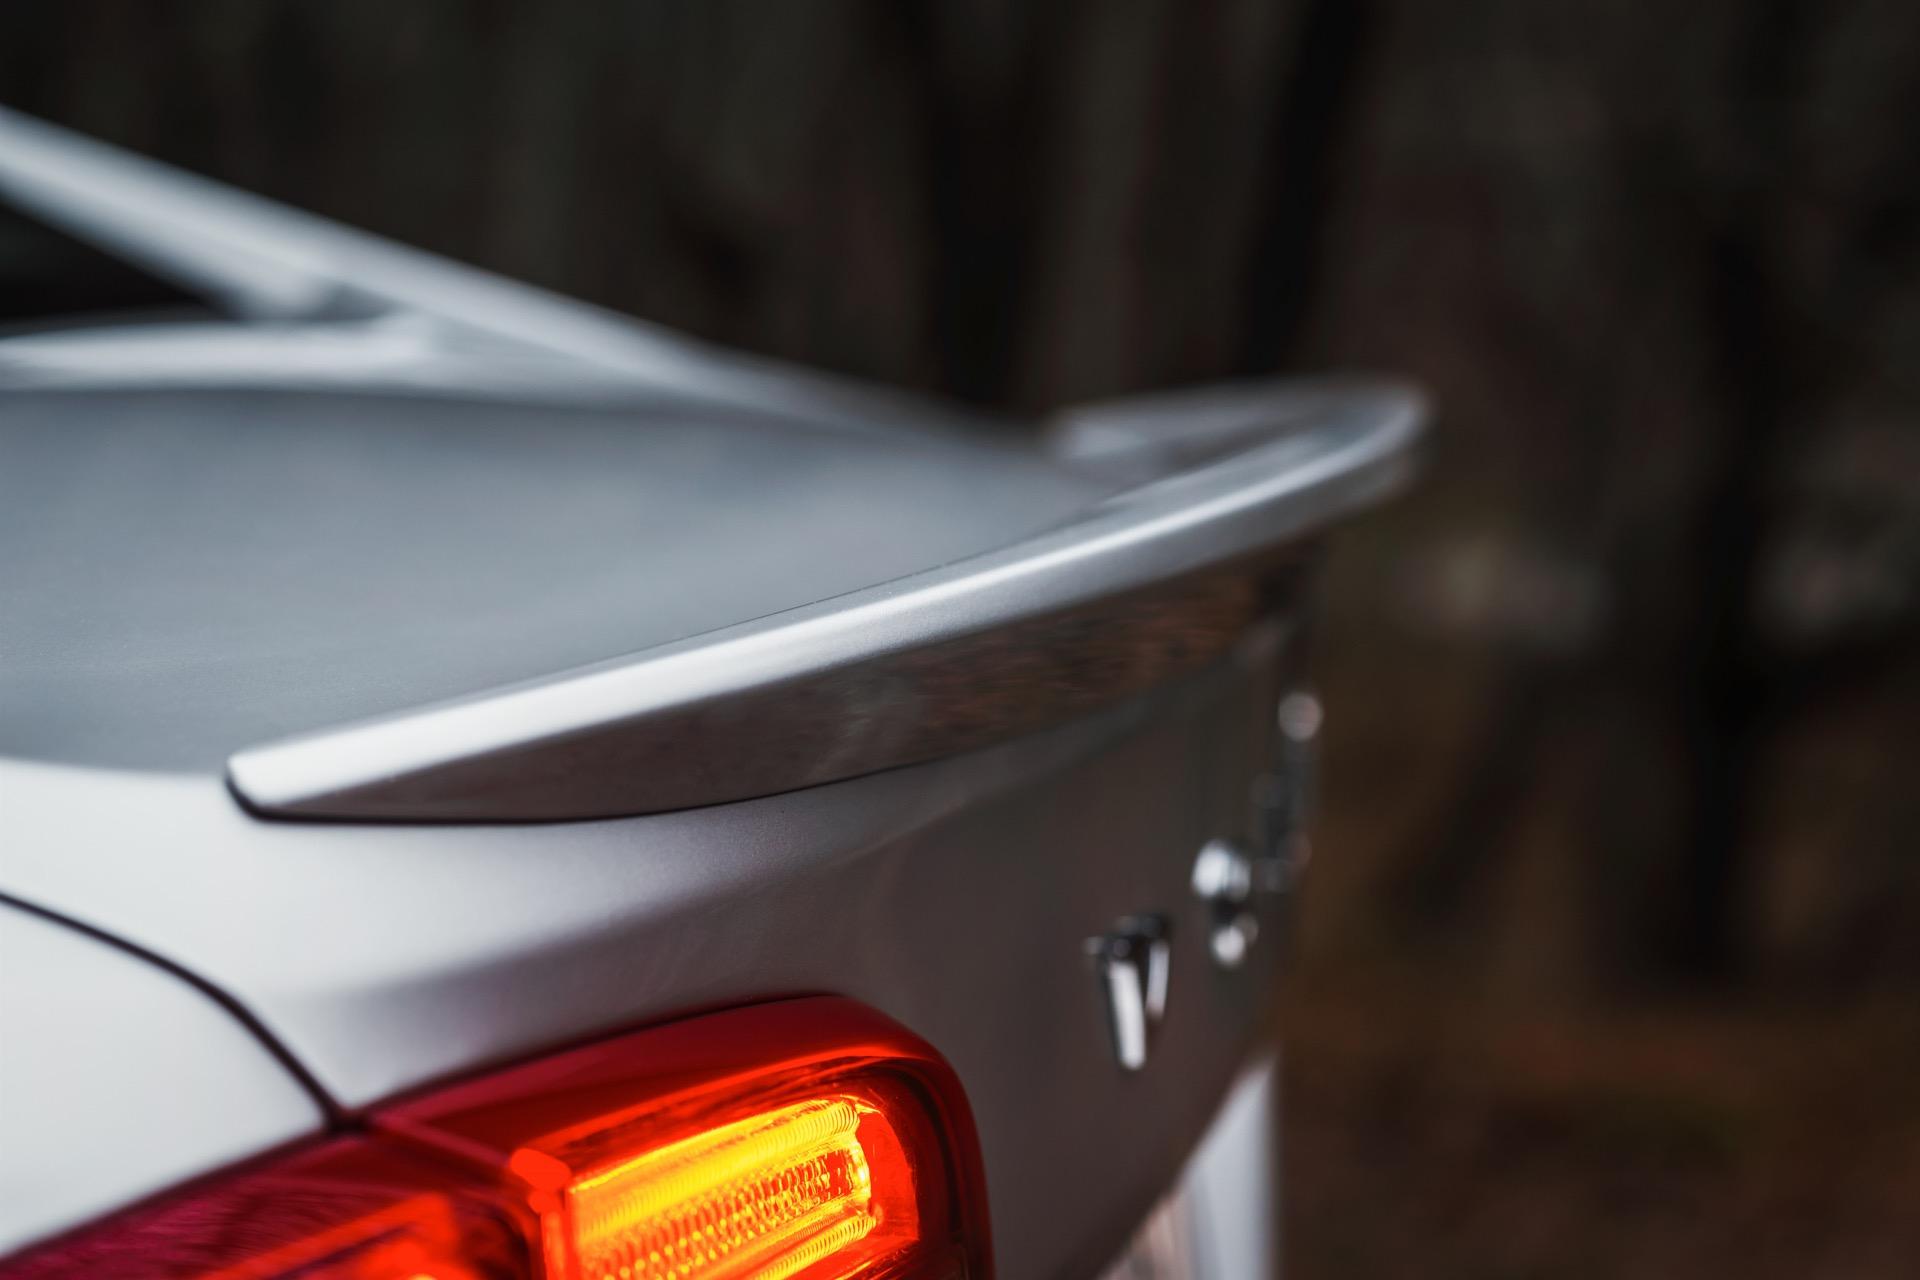 Polestar Parts, Wing Volvo S60 -  2016, 2017, 2017 S60, 2018, 2018 S60, Design, Detail, Exterior, Images, Polestar, S60, Volvo